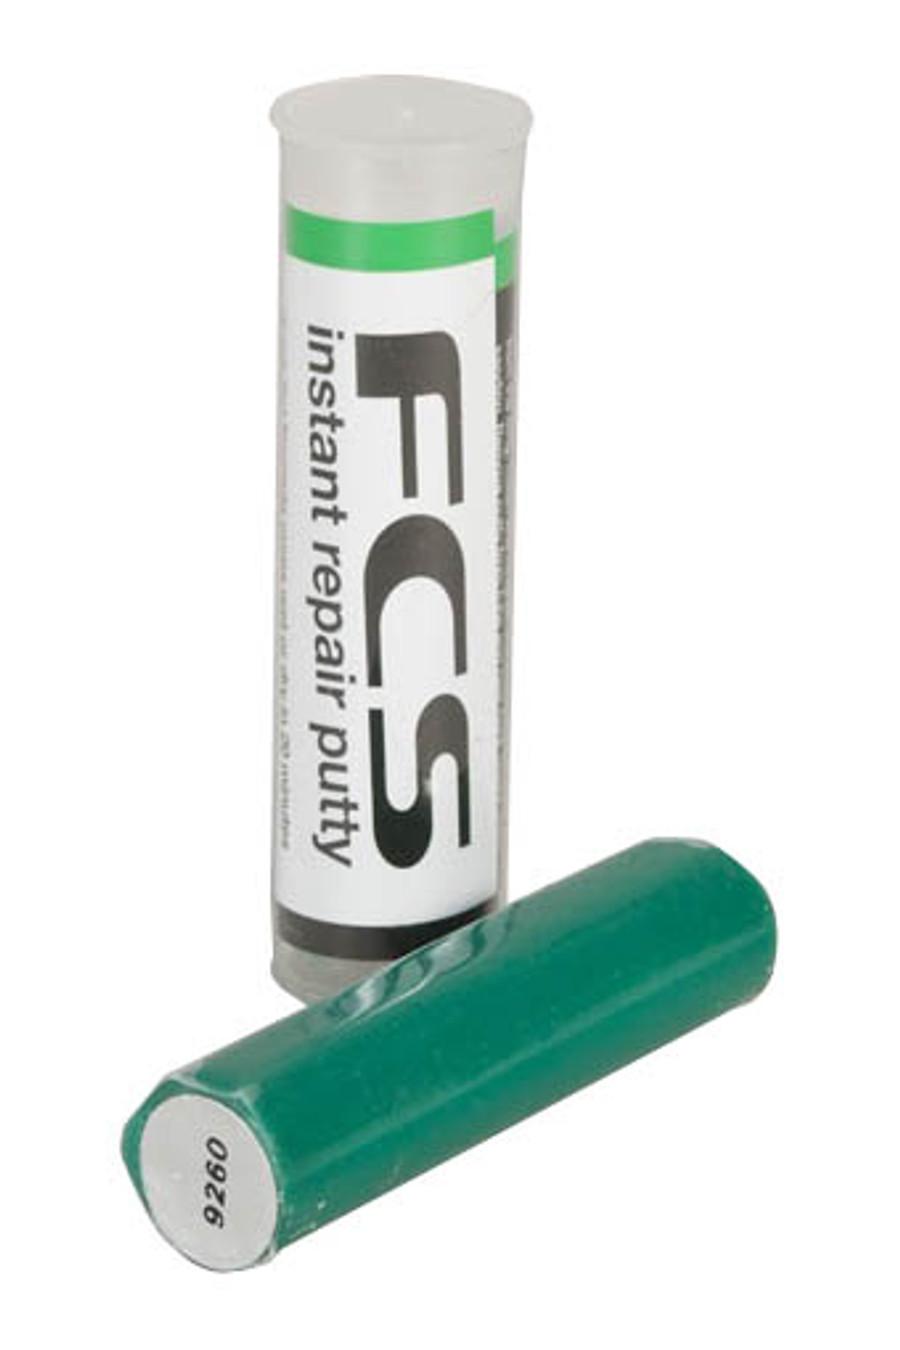 FCS Instant Repair Putty